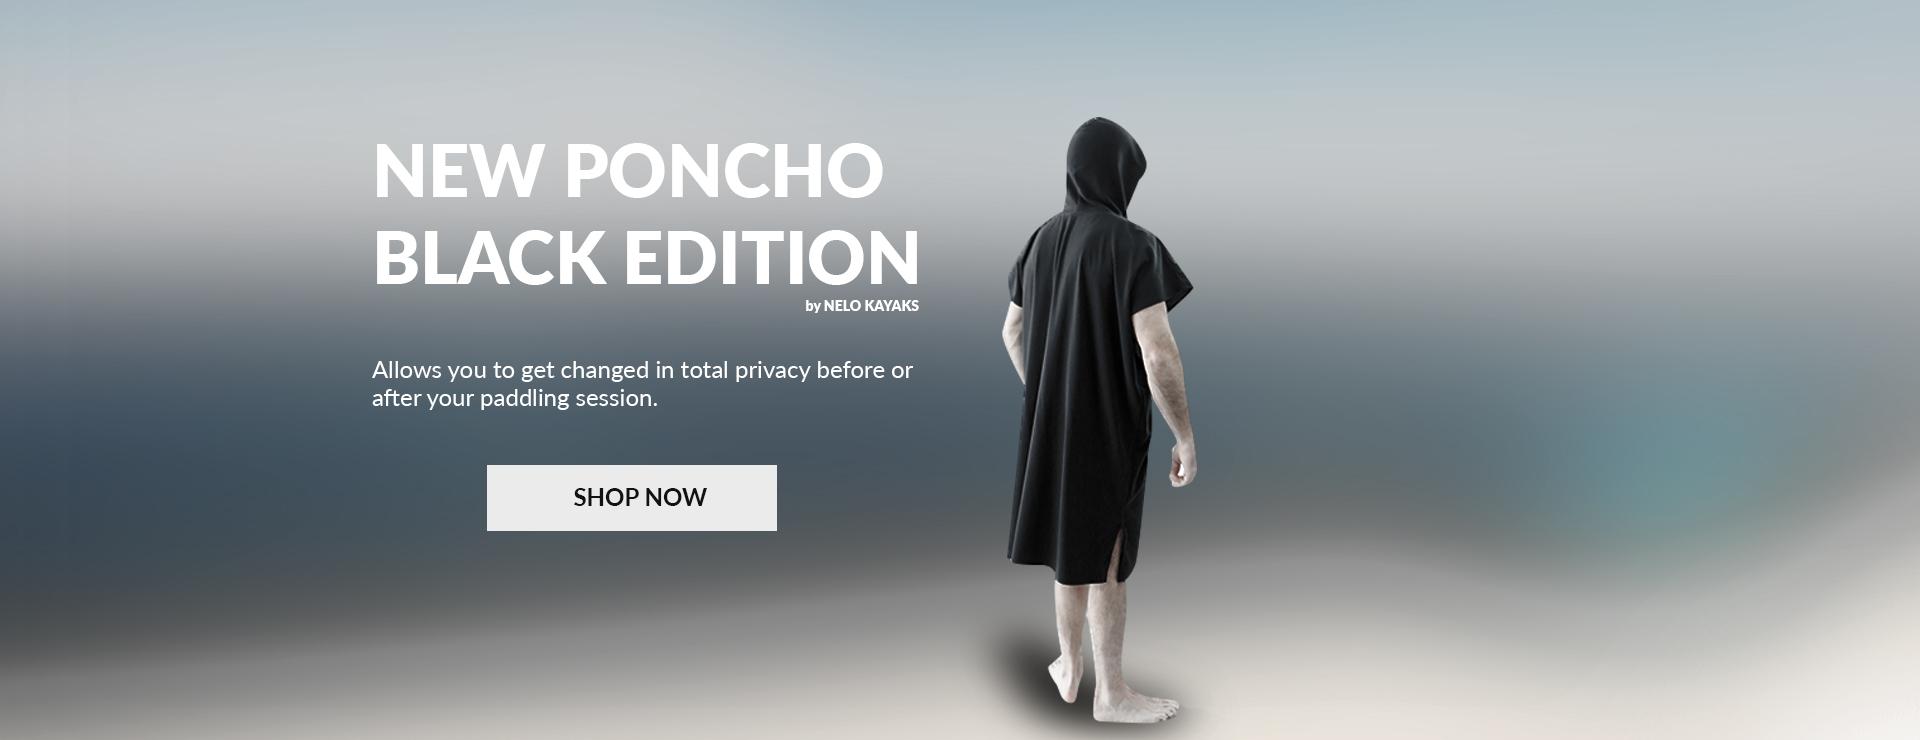 Nelo Black Poncho